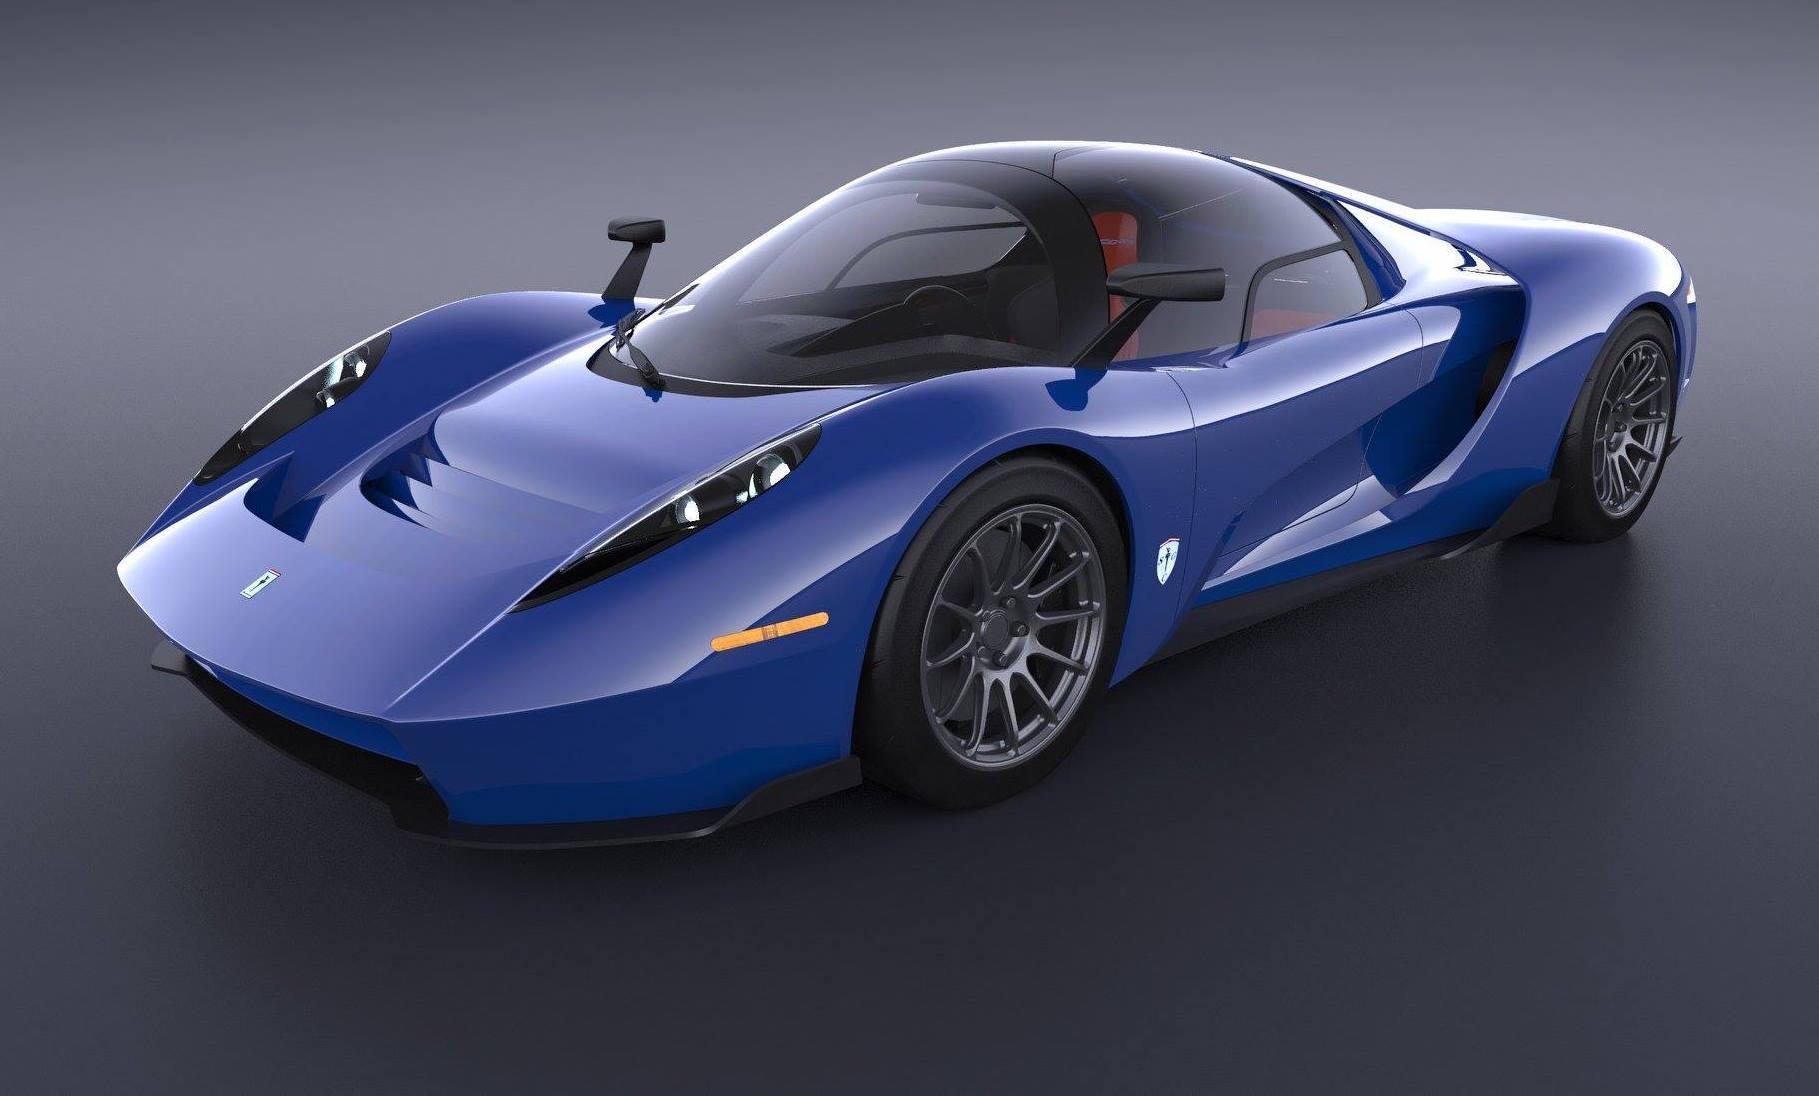 Scuderia Cameron Glickenhaus Scg 004s Review Exotic Car List